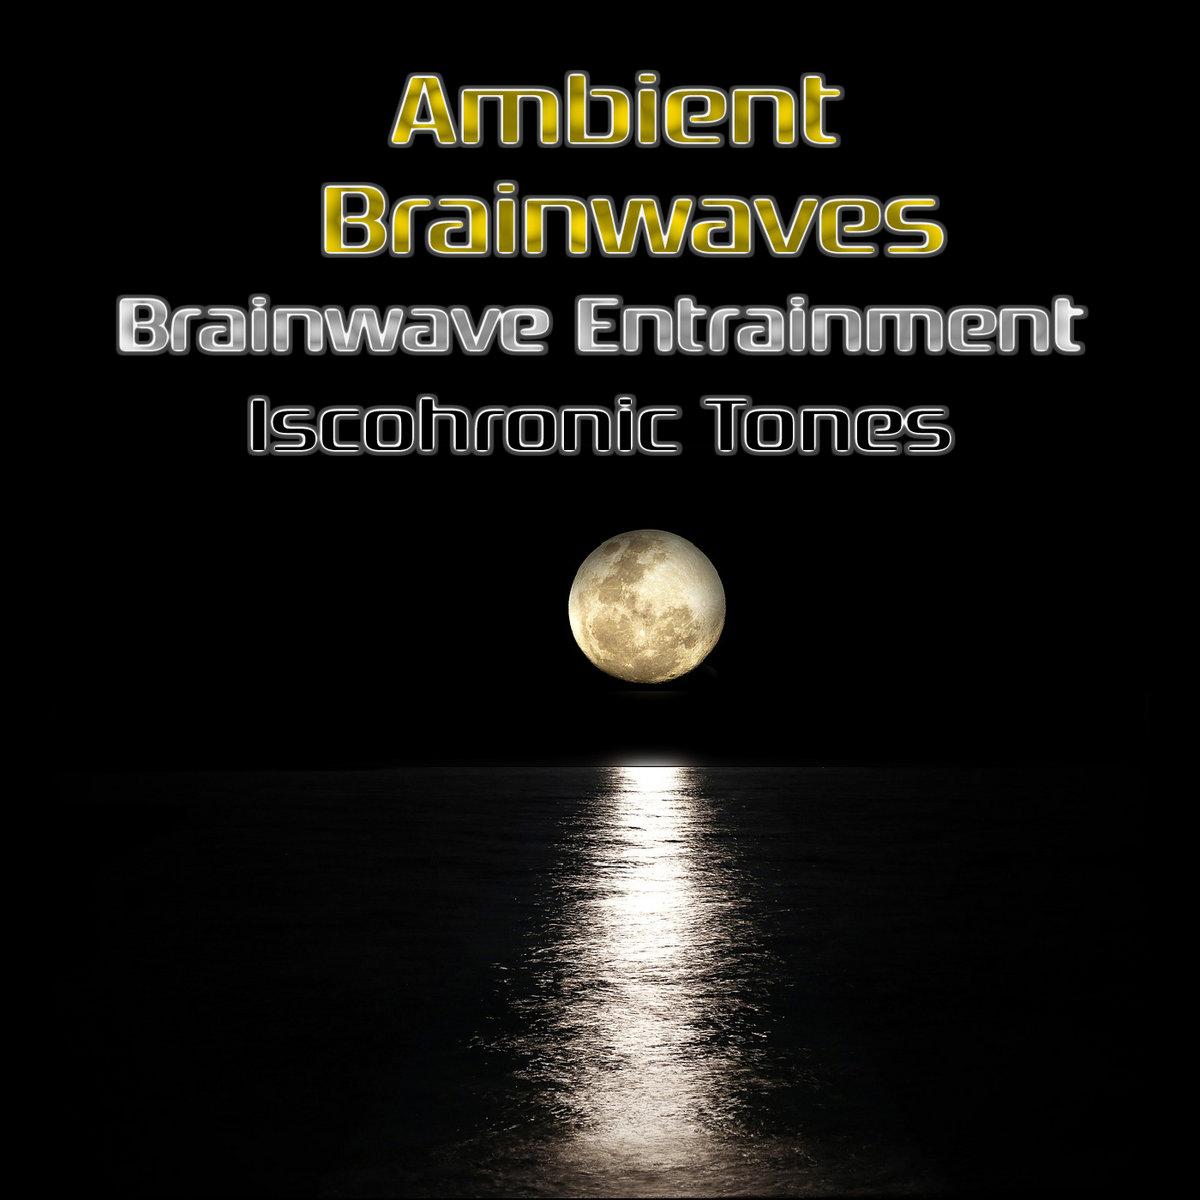 Ambient Isochronic Gamma To Alpha Waves Base = 216 - 108Hz (432Hz